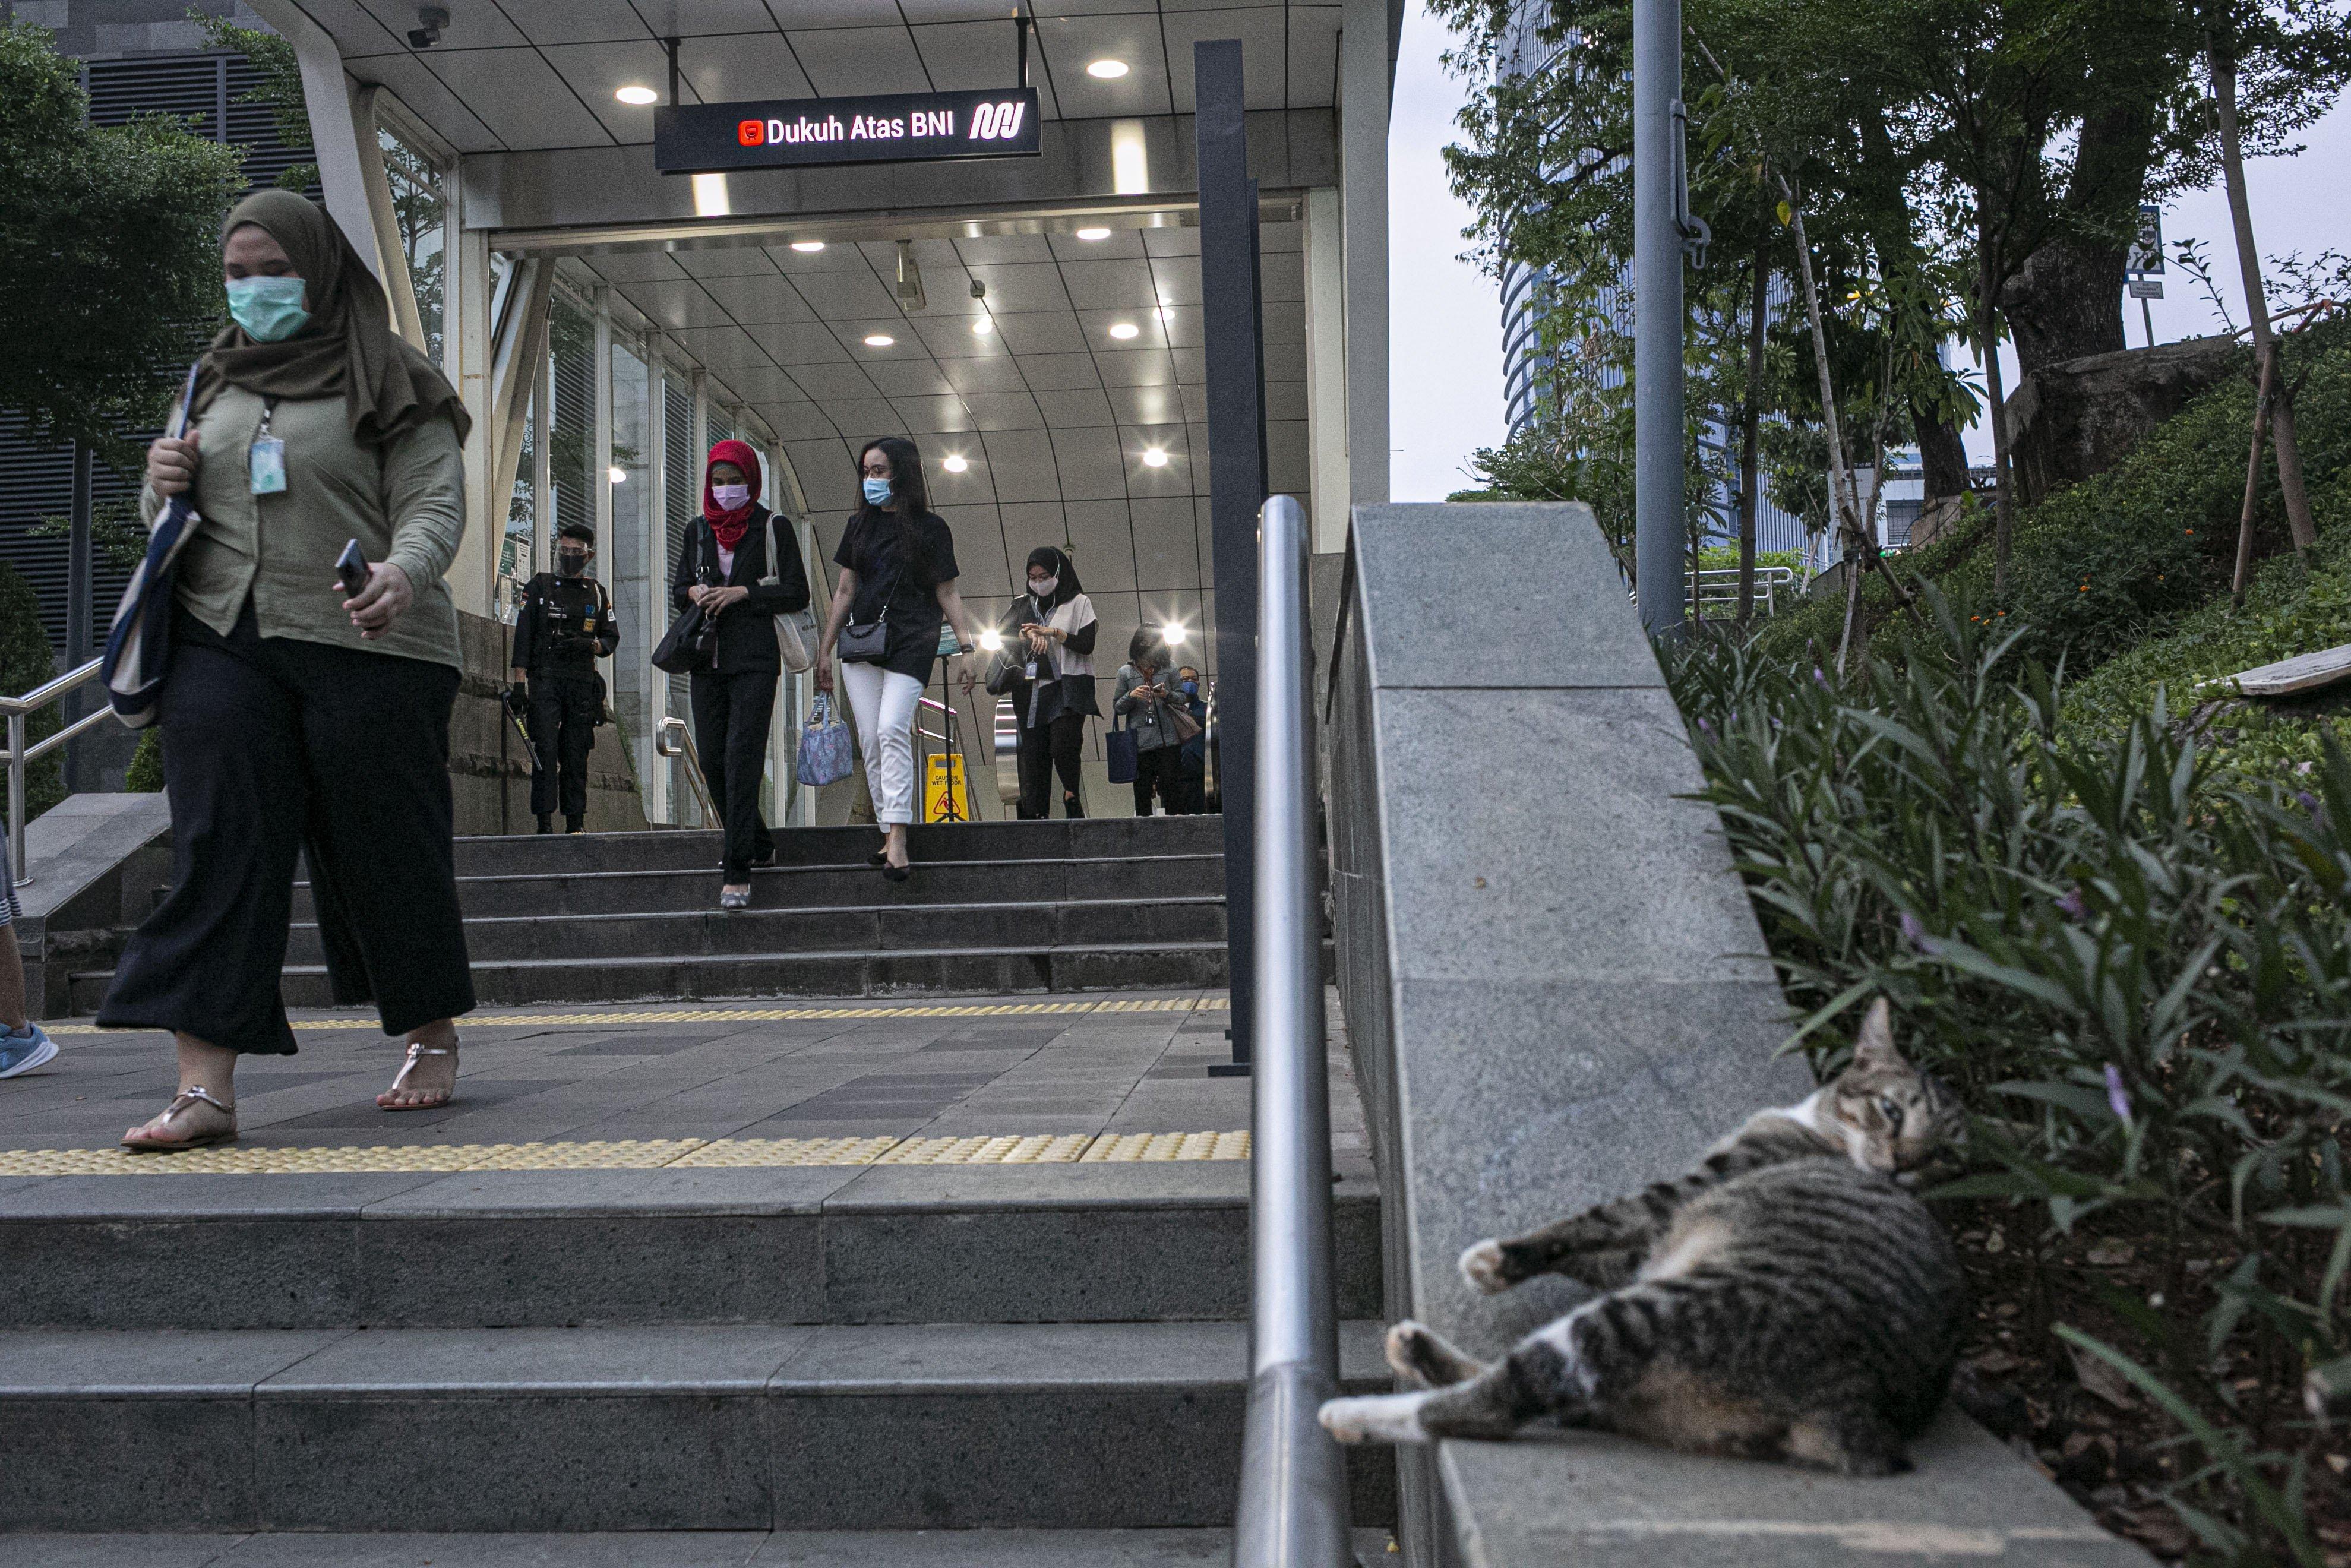 Sejumlah pekerja keluar dari Stasiun MRT Dukuh Atas, Jakarta Pusat, Senin (14/9/2020). Sebelumnya. saat mengumumkan PSBBJakarta diperketat,Anies menyatakan kasus Covid-19 di ibu kota RI itu terbilang mengkhawatirkan. Tambahan kasus harian di Jakarta dalam beberapa hari terakhir mencapai angka 1.000 kasus.